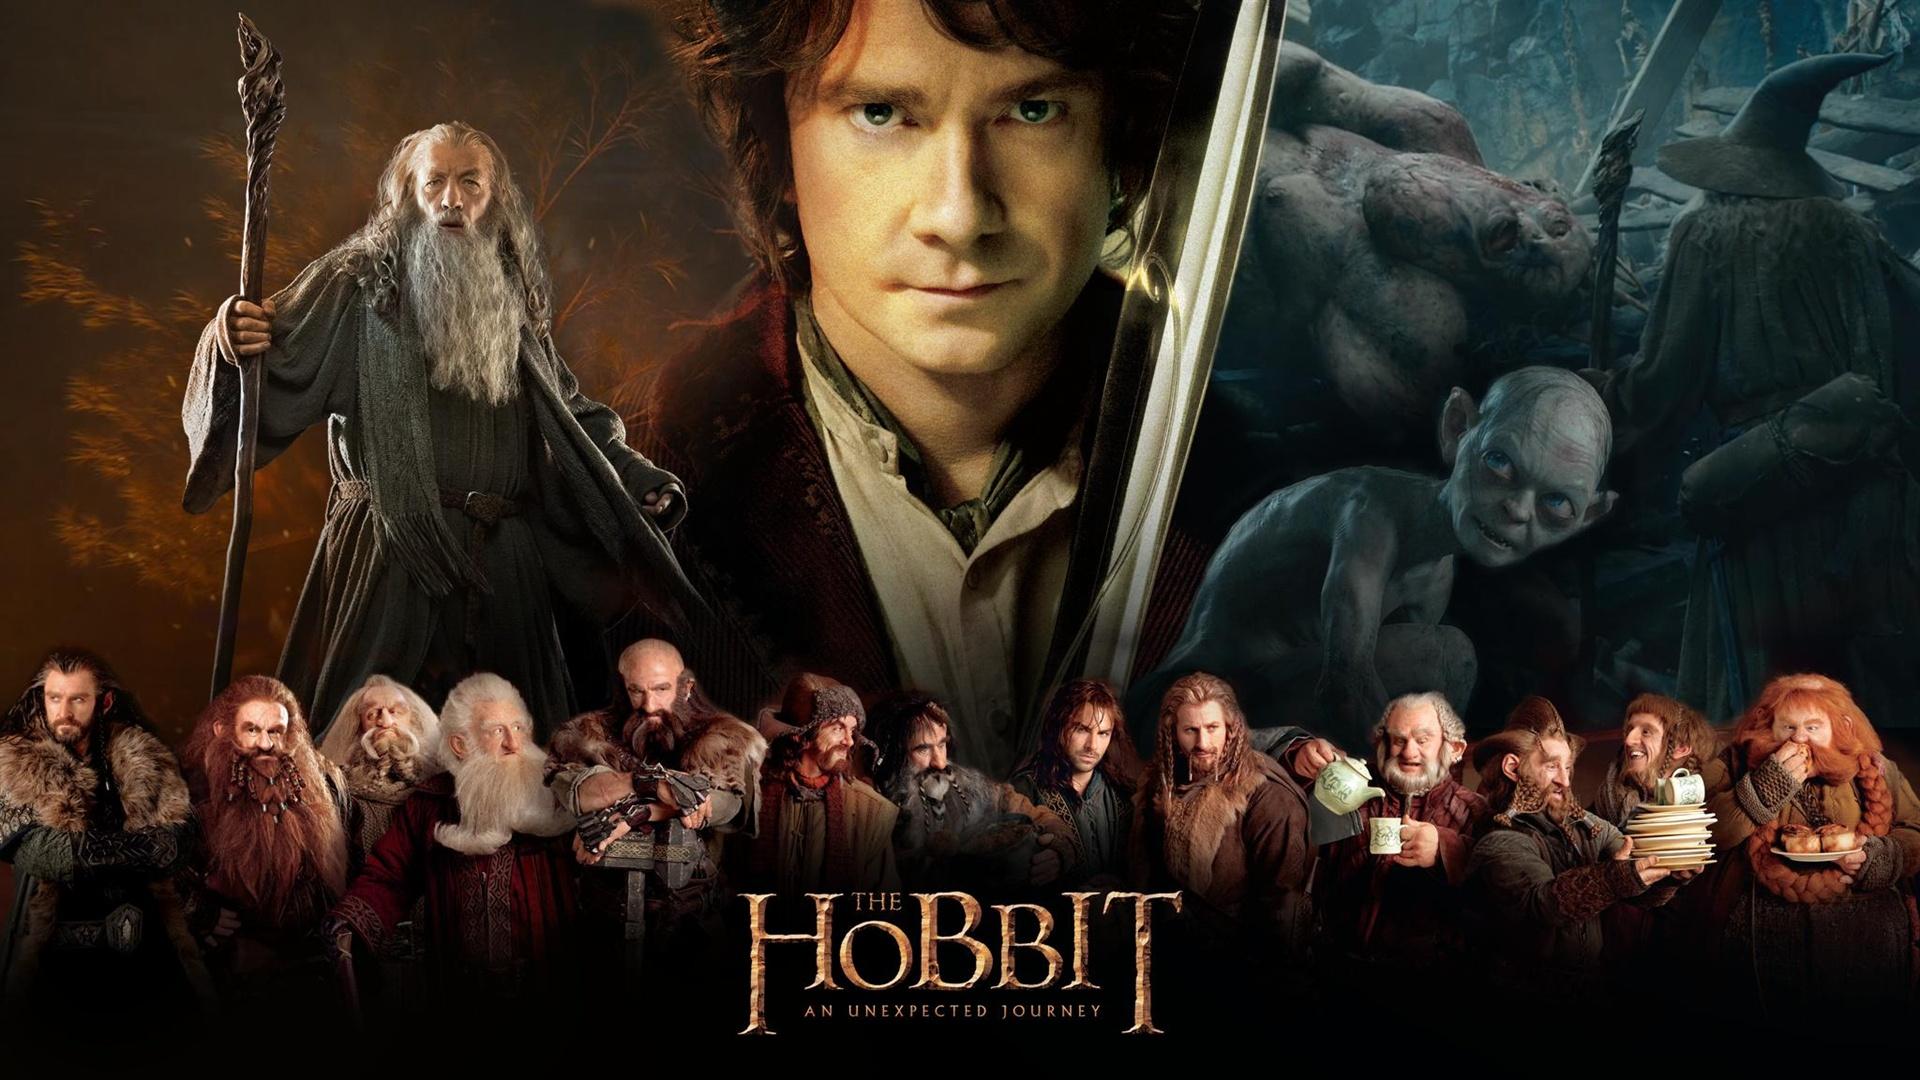 hobbit: un voyage inattendu fonds d'écran x fonds d'écran